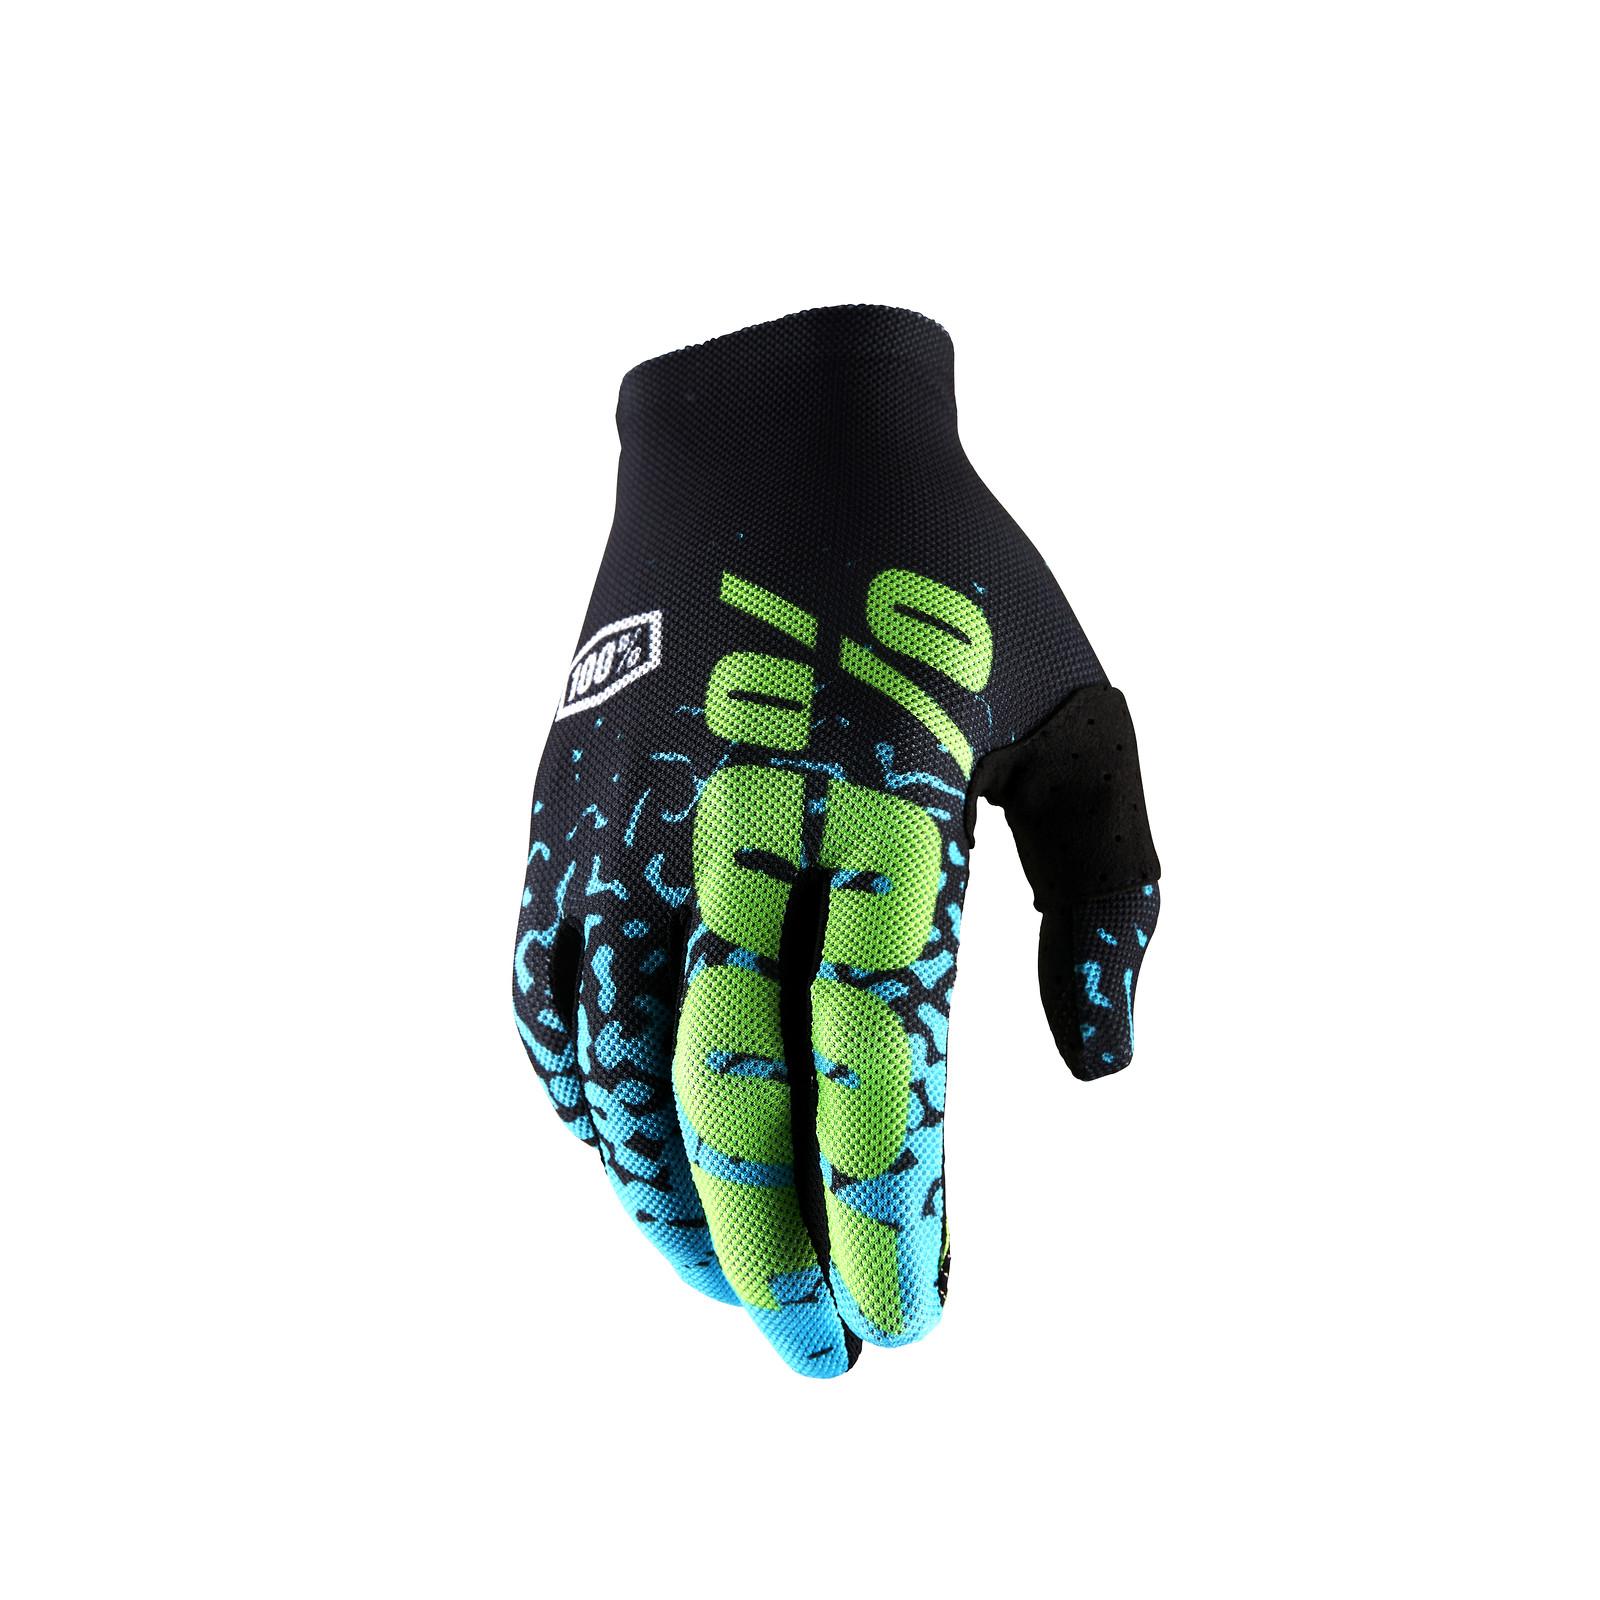 Celium 2 Glove - Flash Black / Cyan - 100percent - Motocross Pictures - Vital MX